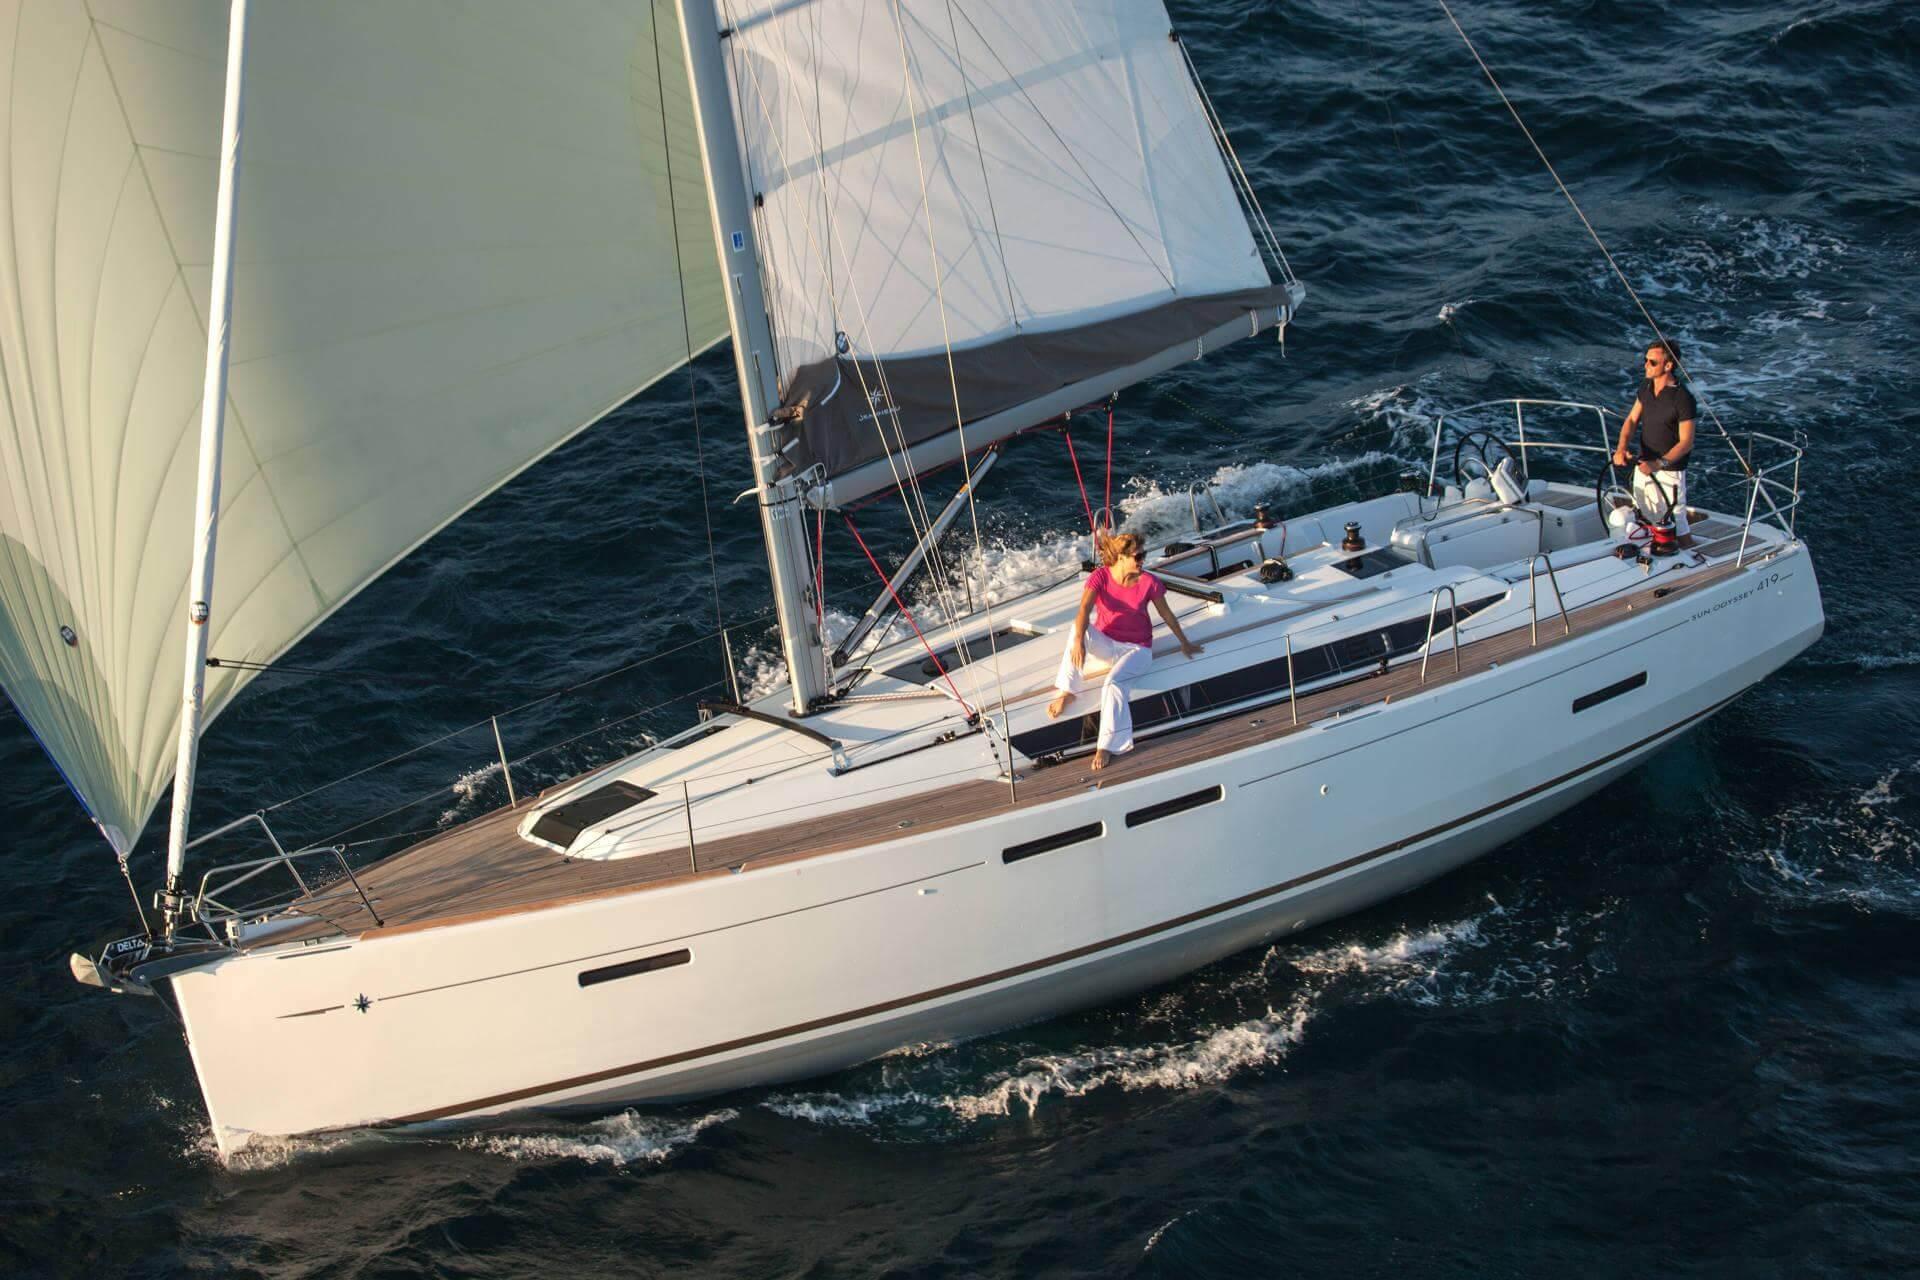 Sun odyssey 419 Sailing in Greece yacht charter Ionian islands Odysseus